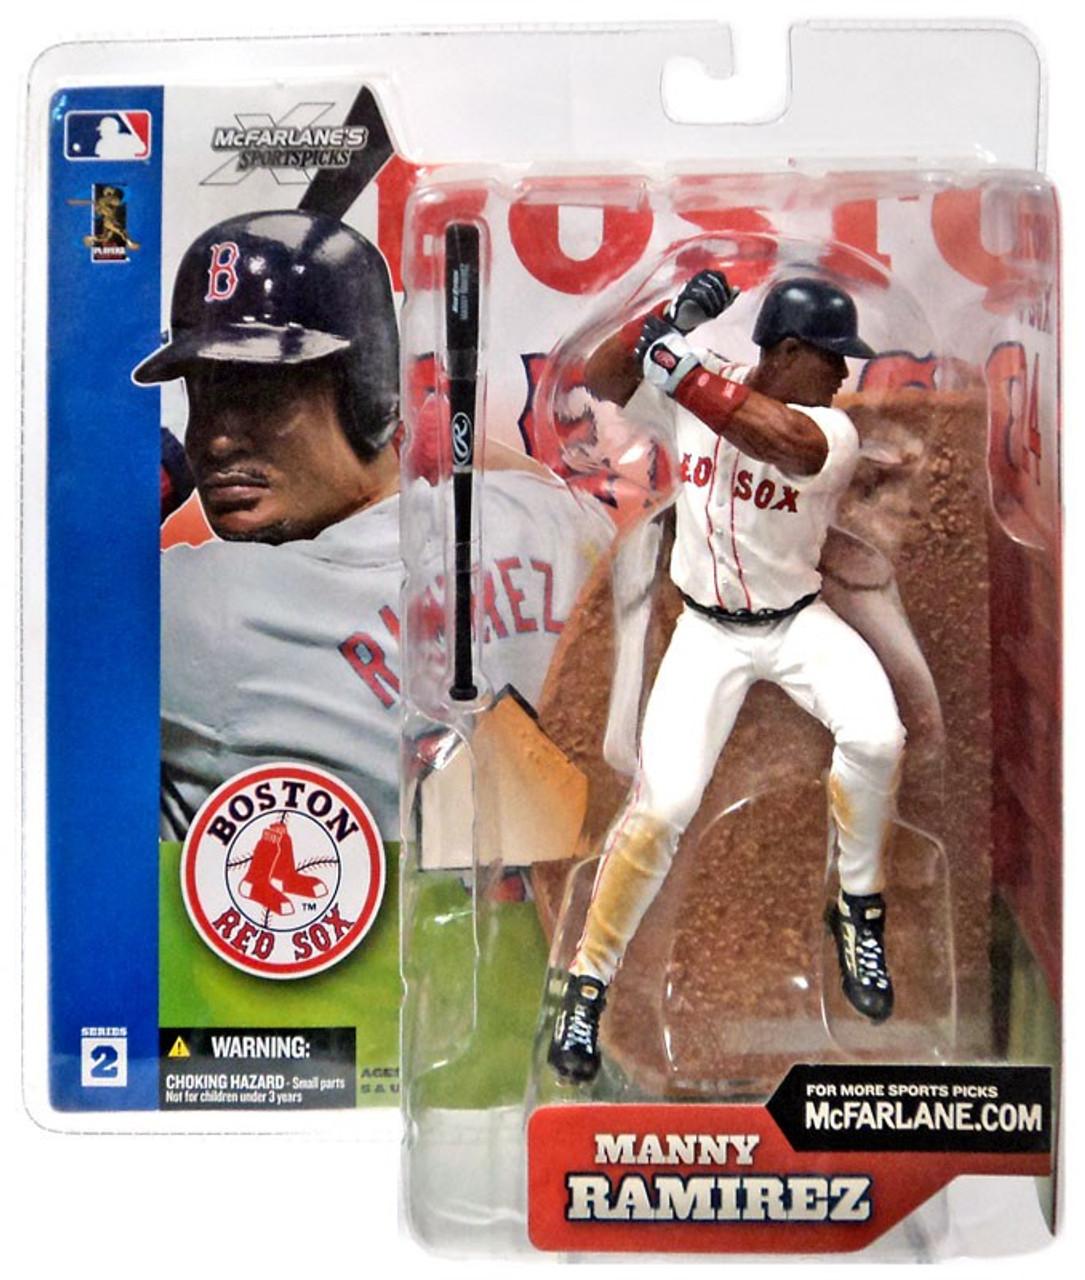 McFarlane Toys MLB Boston Red Sox Sports Picks Series 2 Manny Ramirez Action Figure [White Jersey Variant]